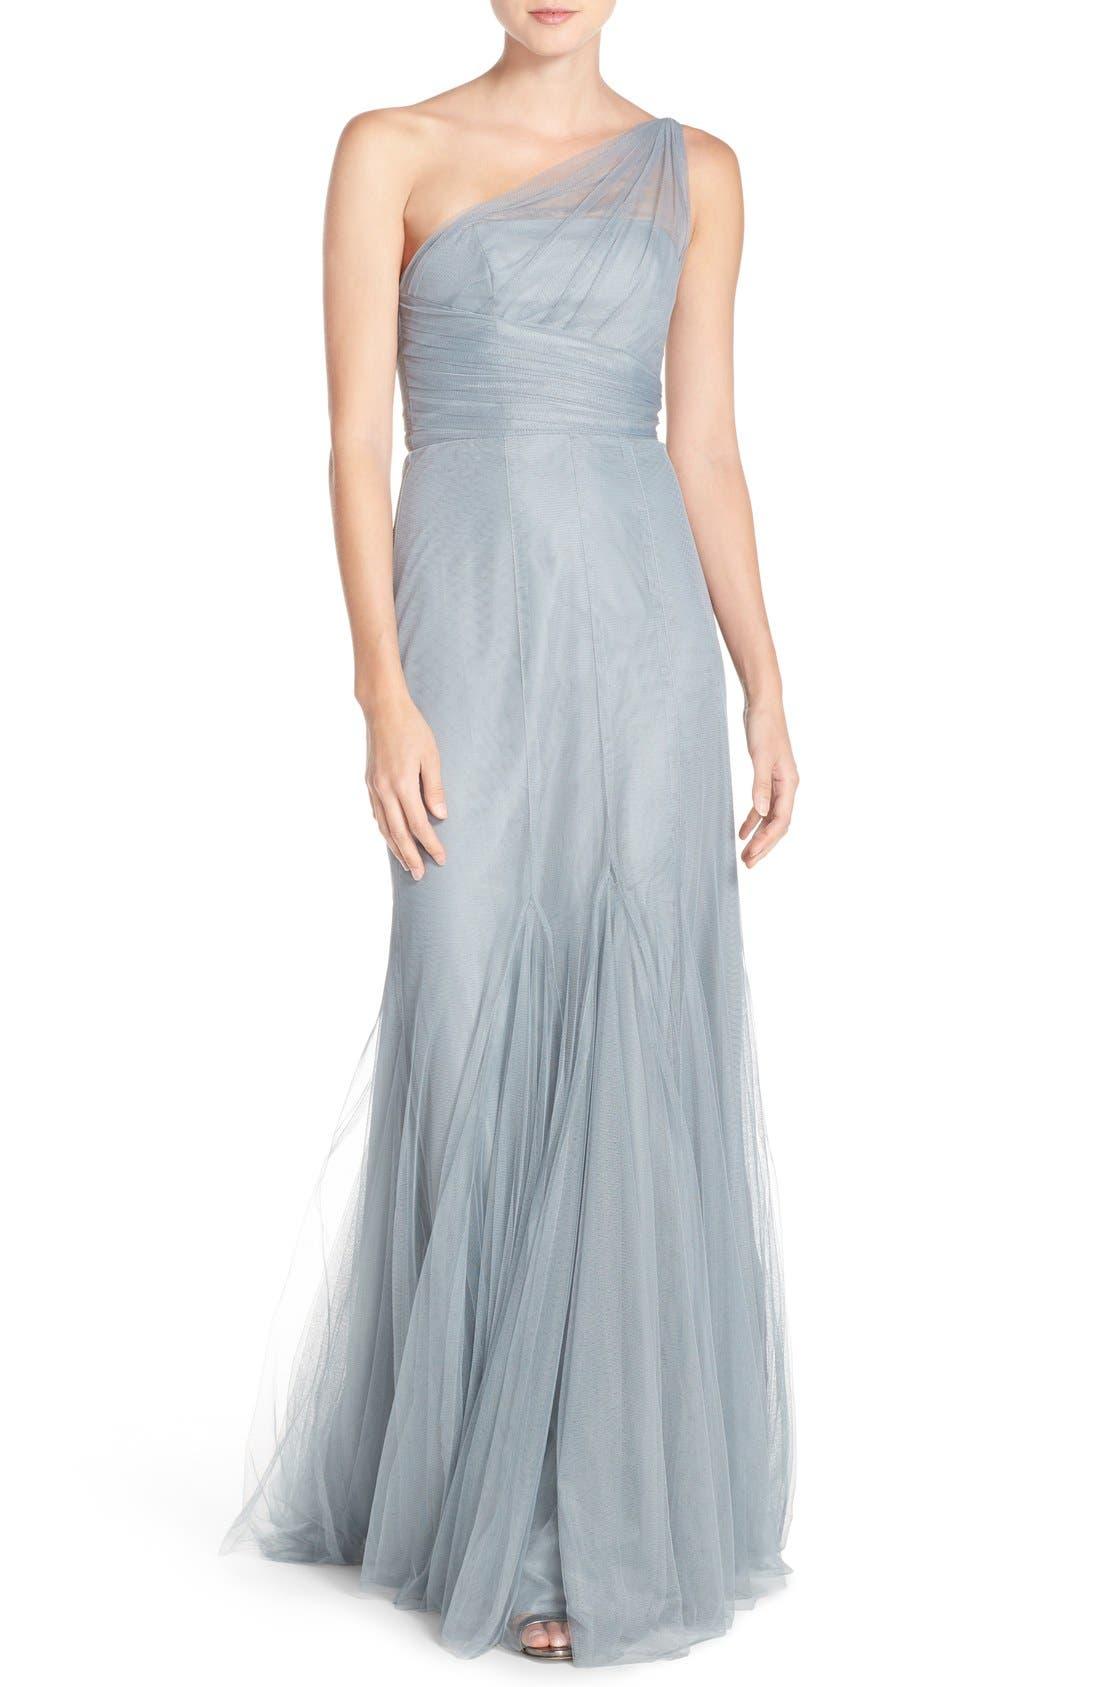 Alternate Image 1 Selected - Monique Lhuillier Bridesmaids One-Shoulder Tulle Trumpet Gown